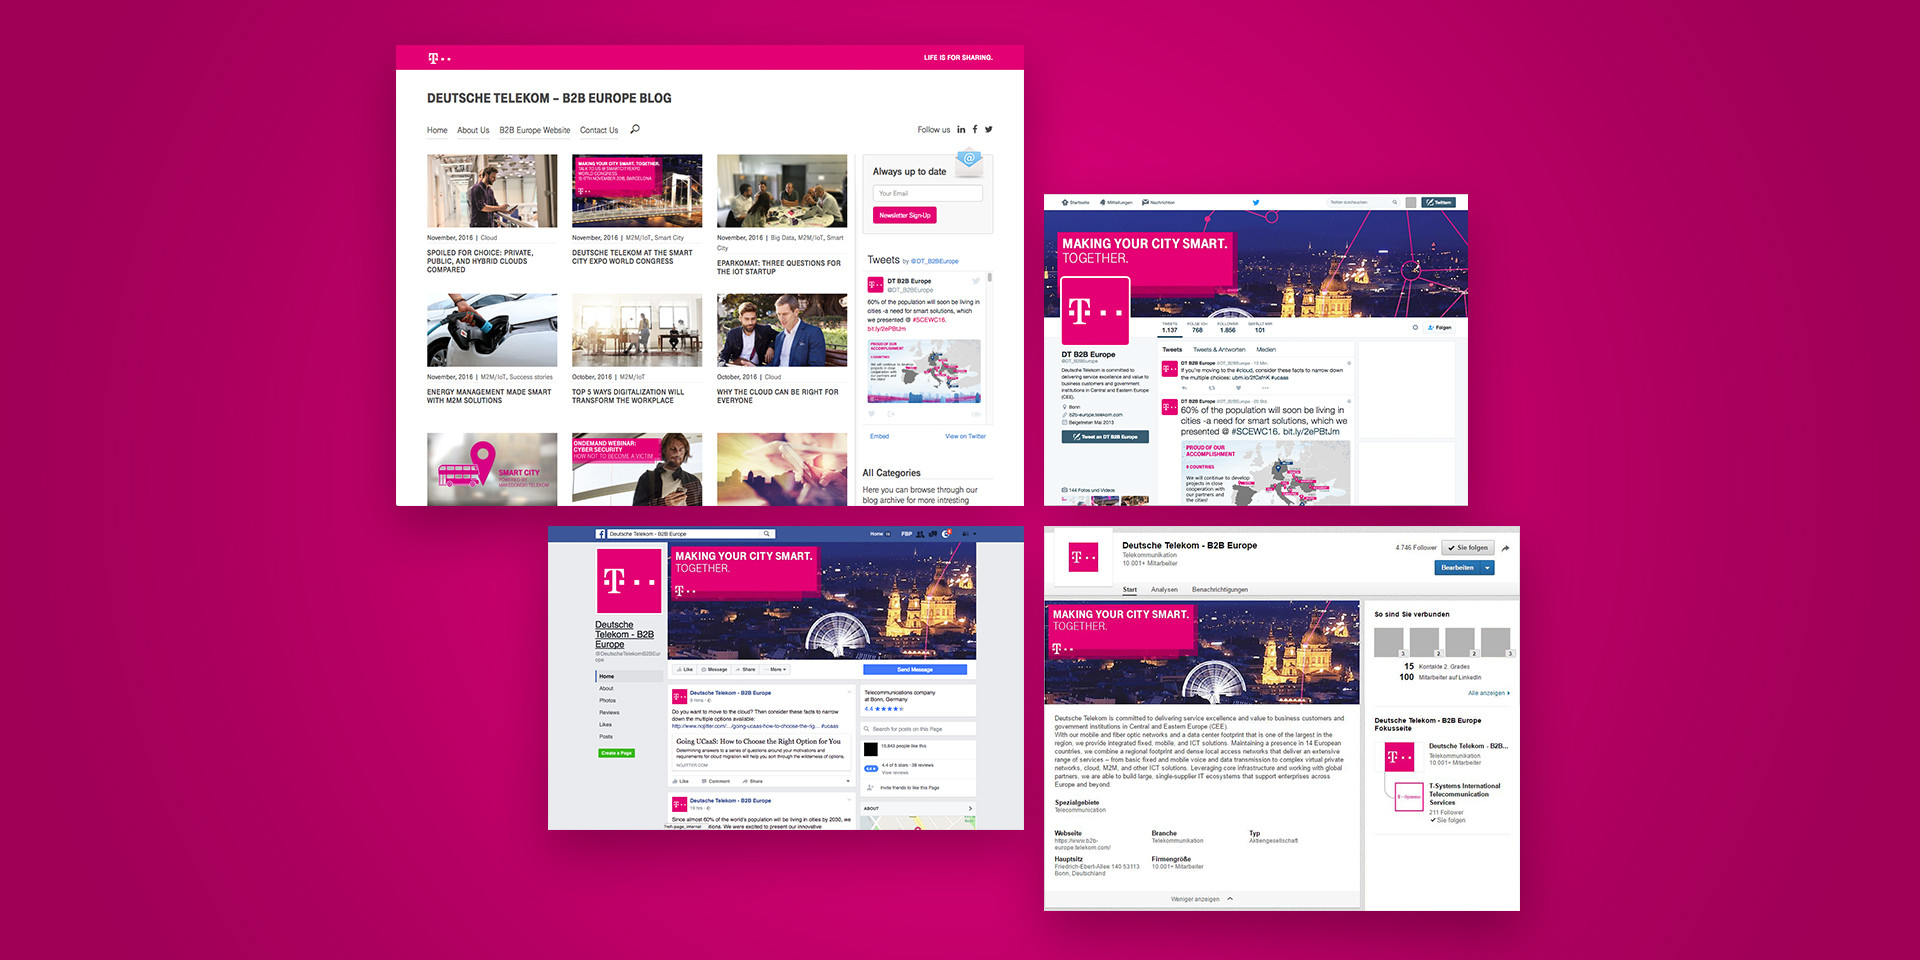 Deutsche Telekom – B2B Europe – Blog & Social Media